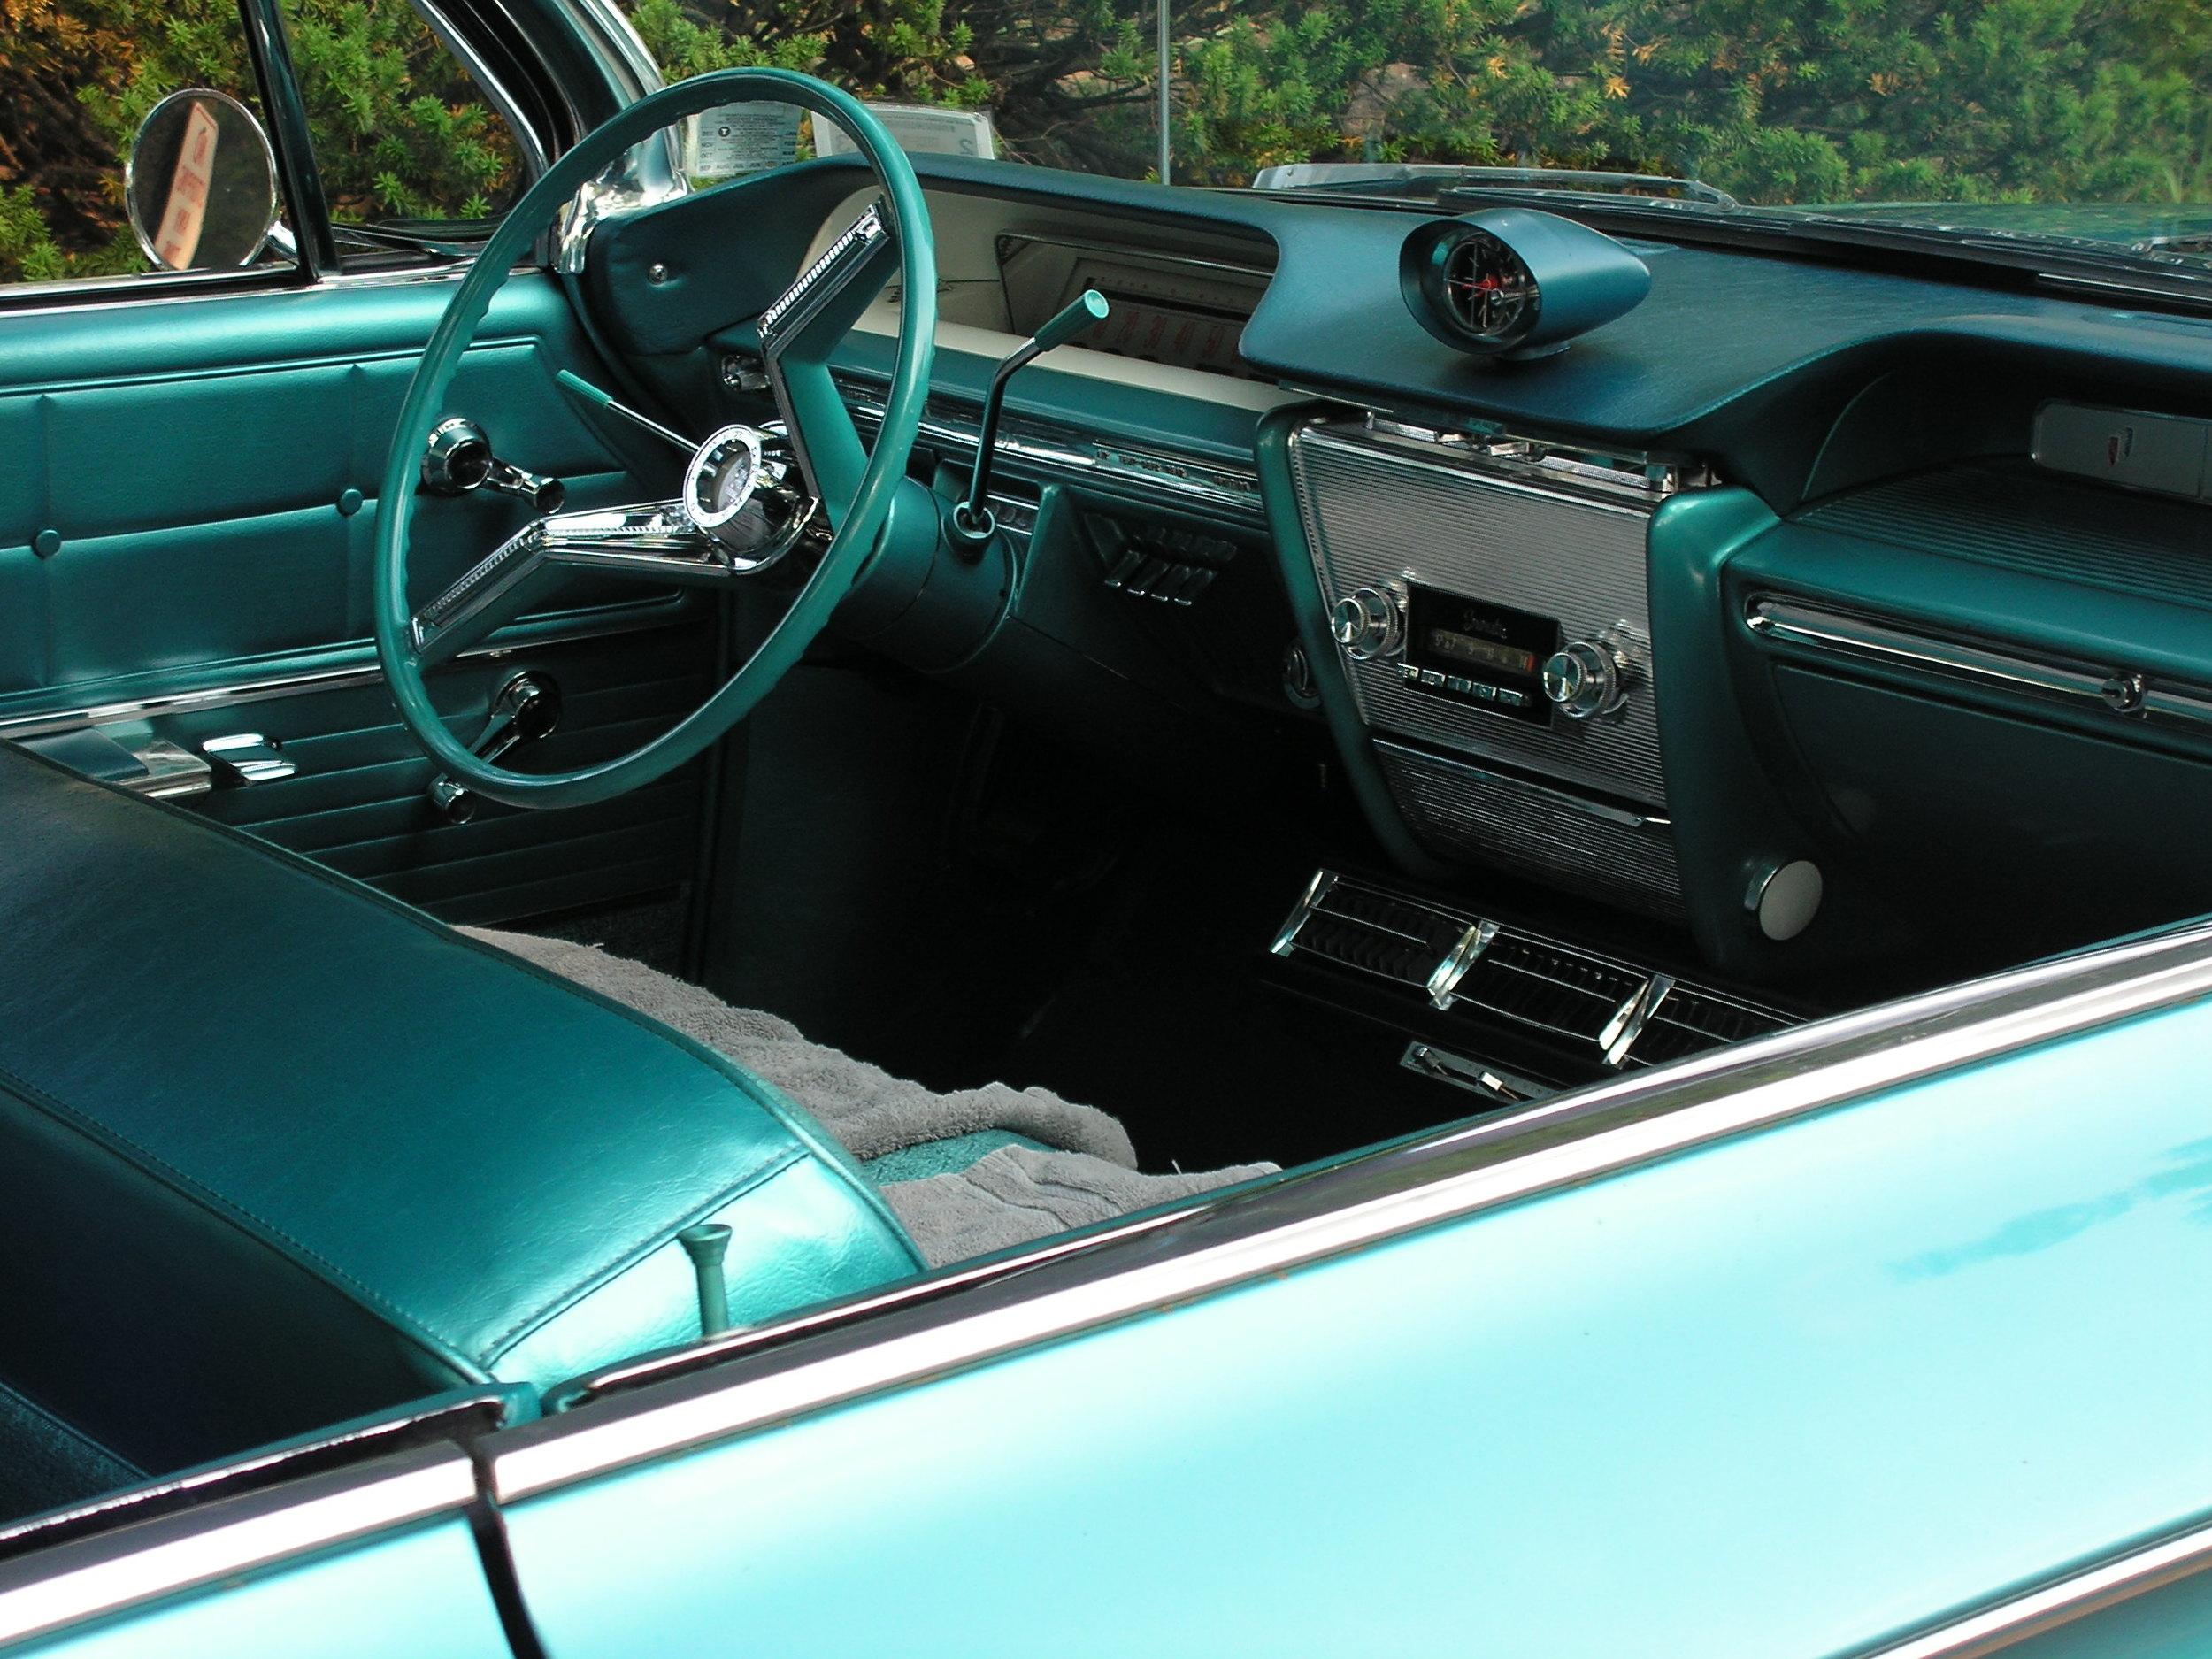 1961 Electra Hardtop Coupe